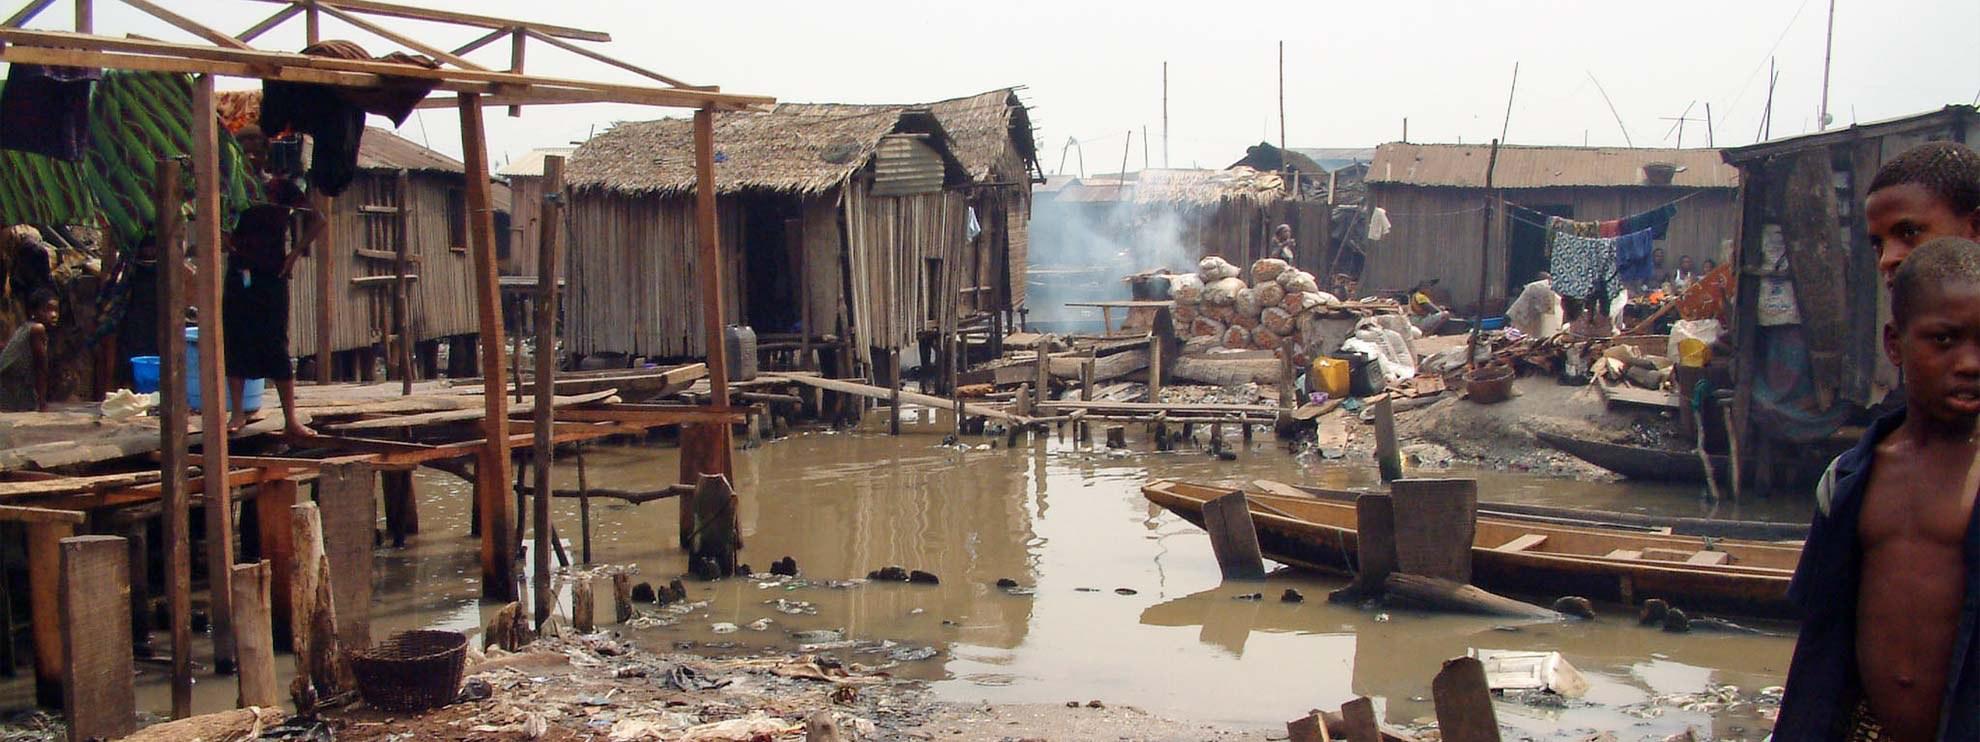 Slum in Makoko (Lagos, Nigeria) © Amnesty International